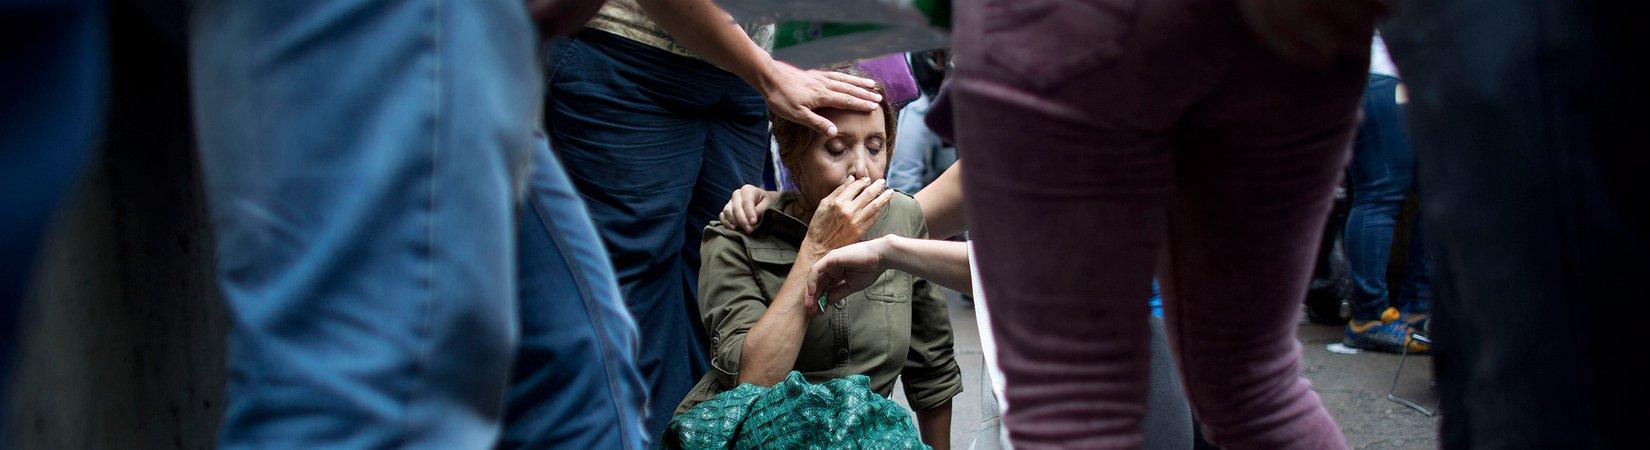 Las cuatro etapas del colapso de Venezuela